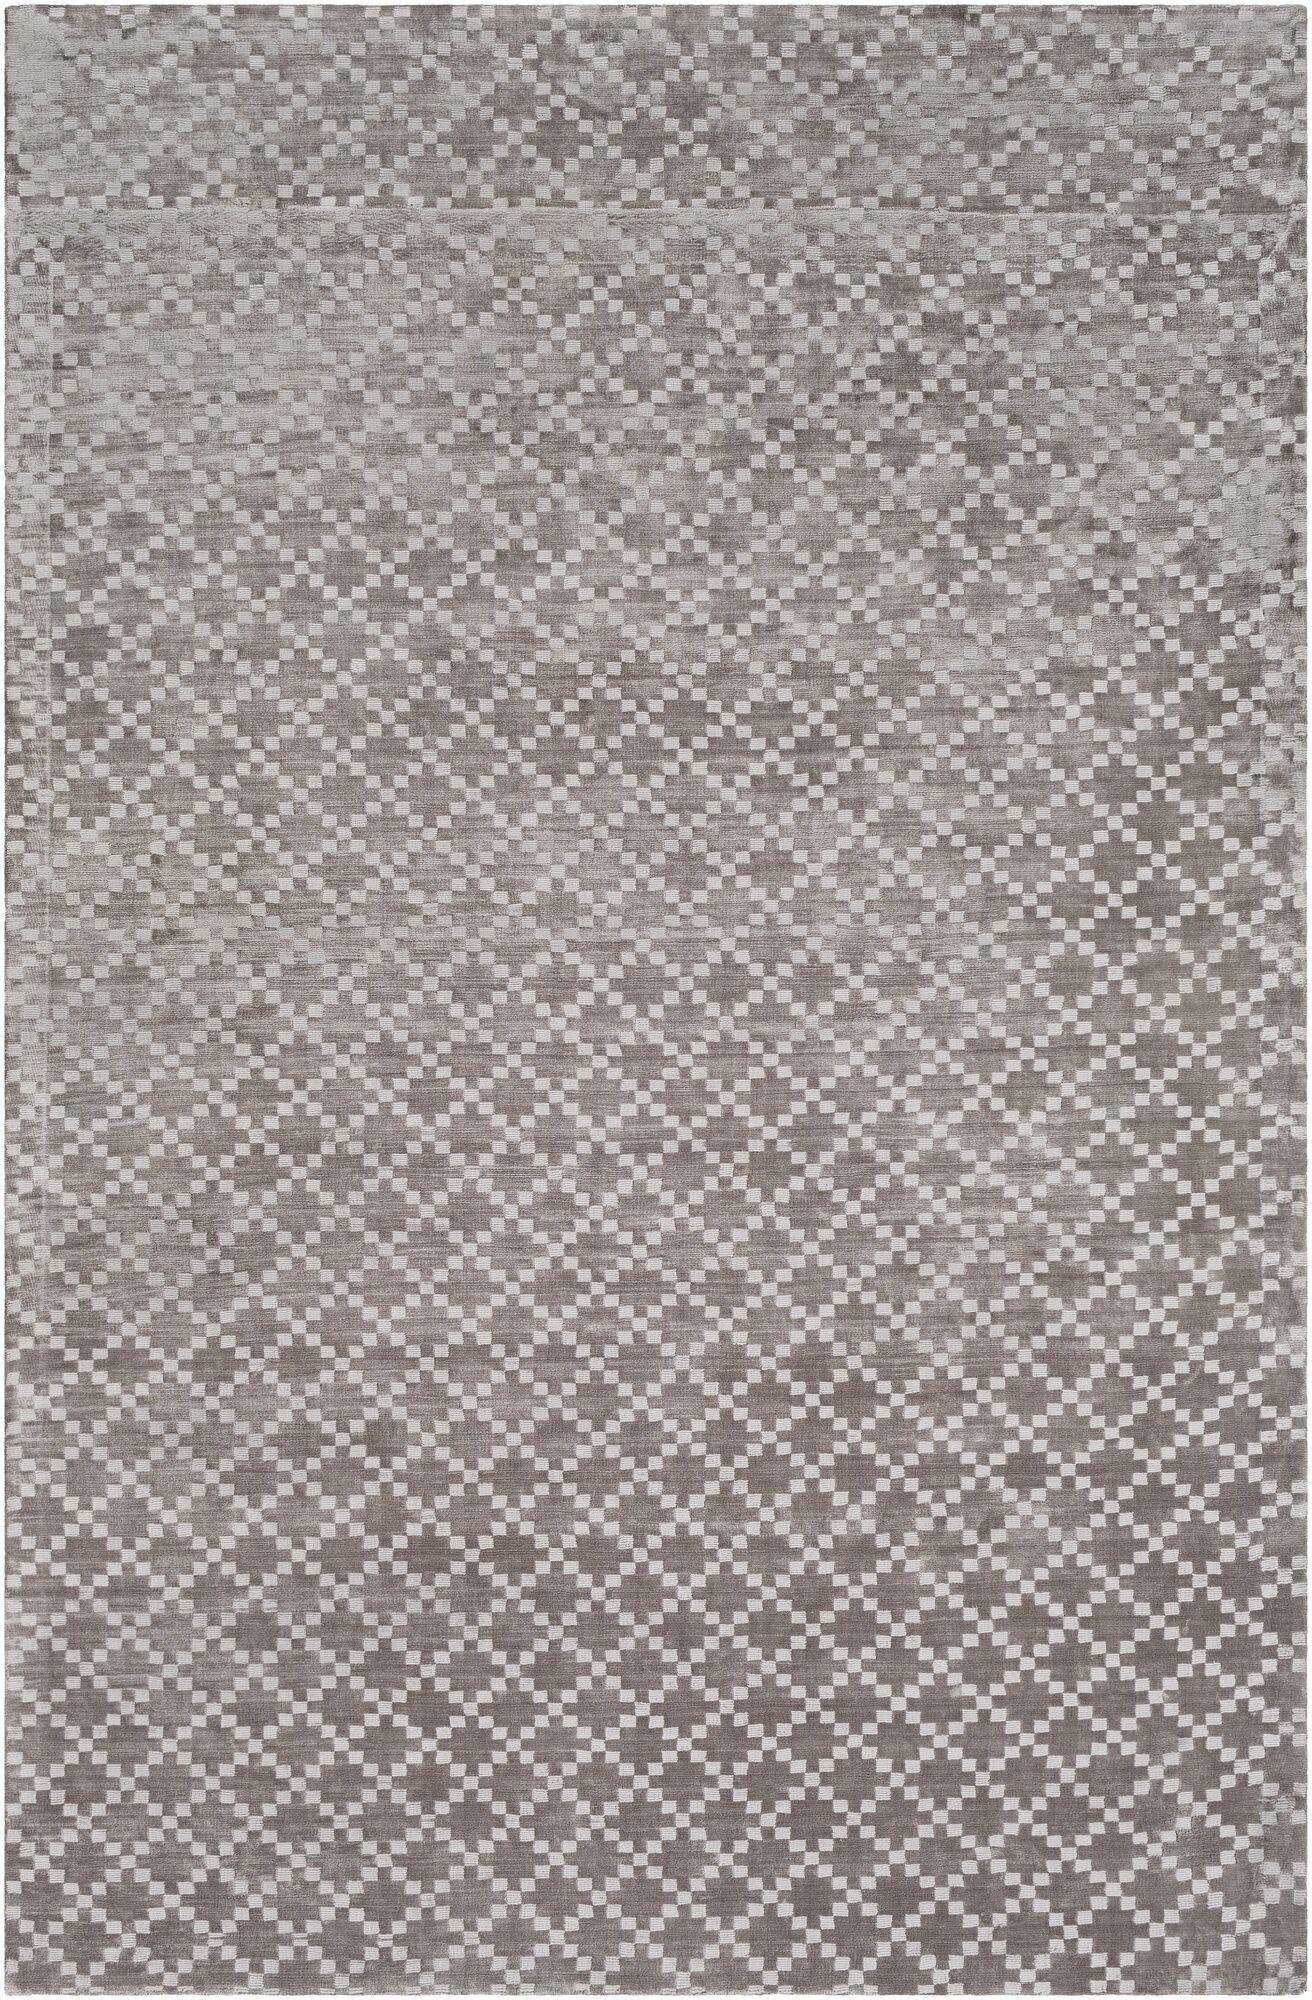 Tudor Hand Woven Medium Gray Area Rug Rug Size: Rectangle 2' x 3'